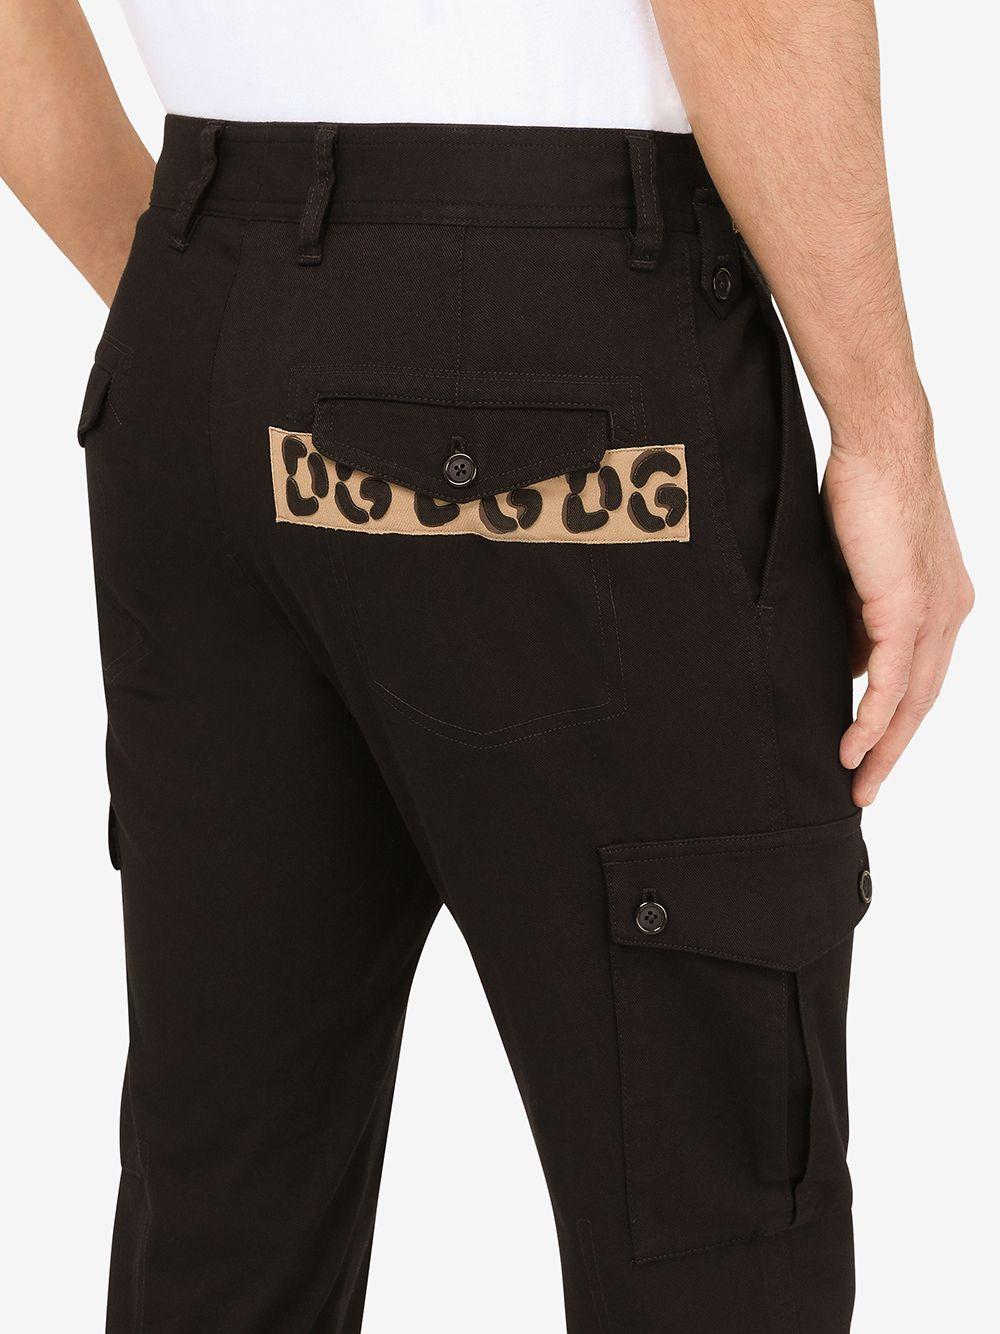 pantalone slim fit in cotone nero e pannelli a contrasto leopardati DOLCE & GABBANA | Pantaloni | GYA8EZ-FUFJUN0000